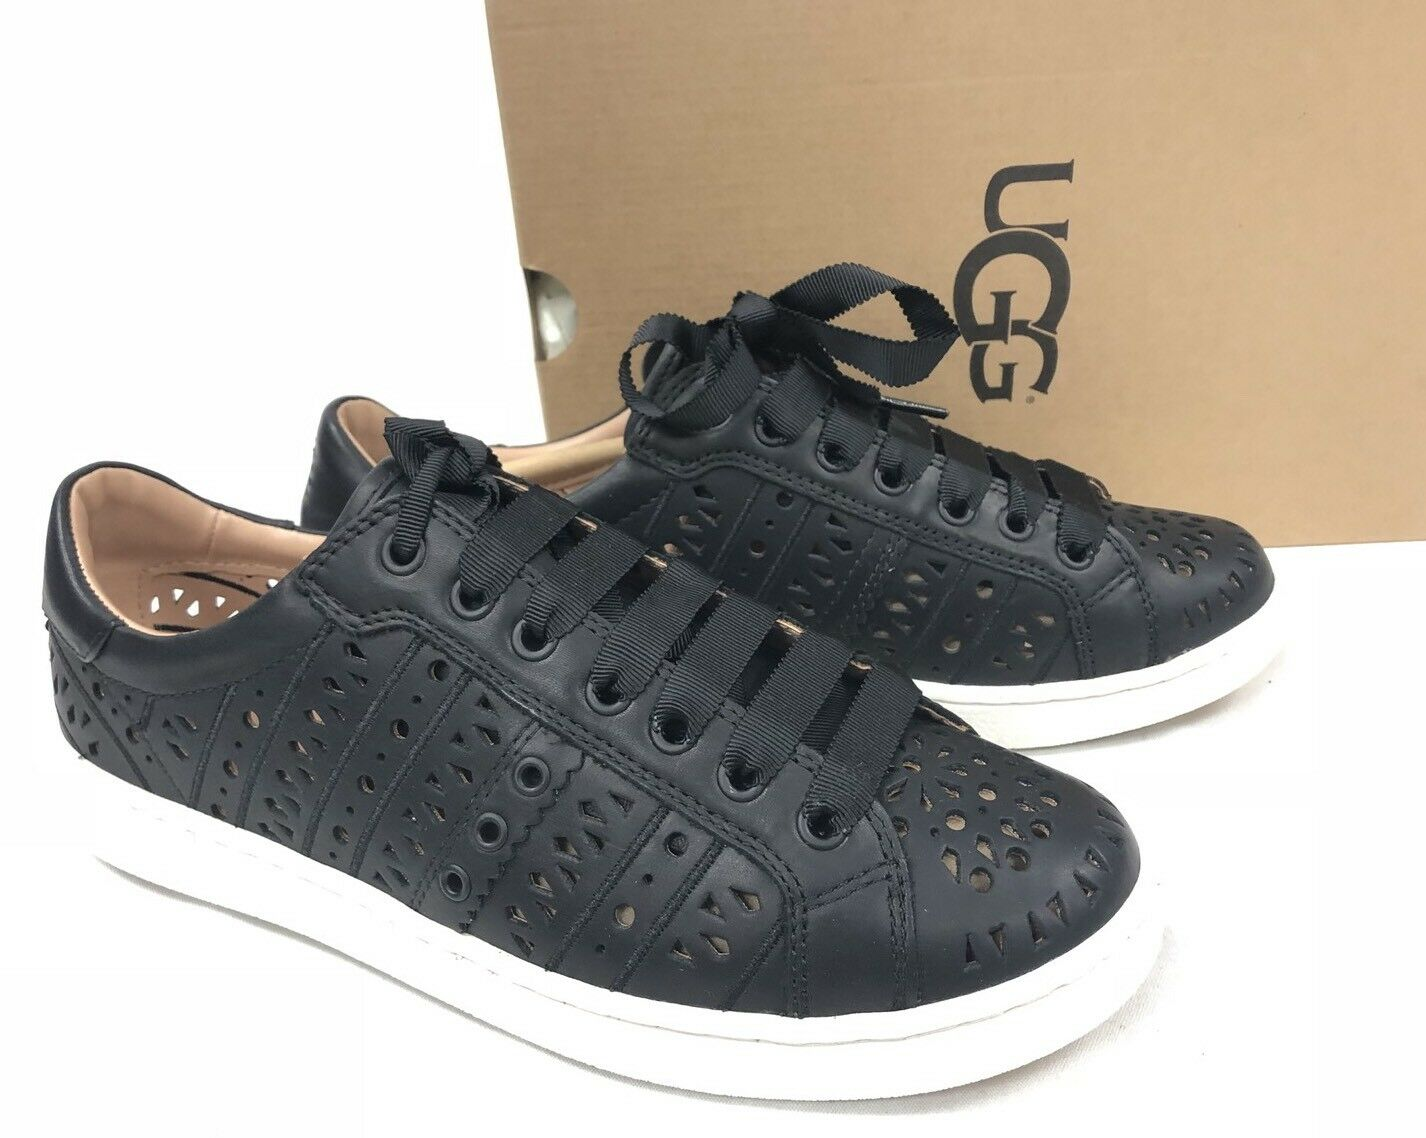 Ugg Australia Milo Perf Schwarze Sneakers mit Schnürung Tennisschuhe 1092071